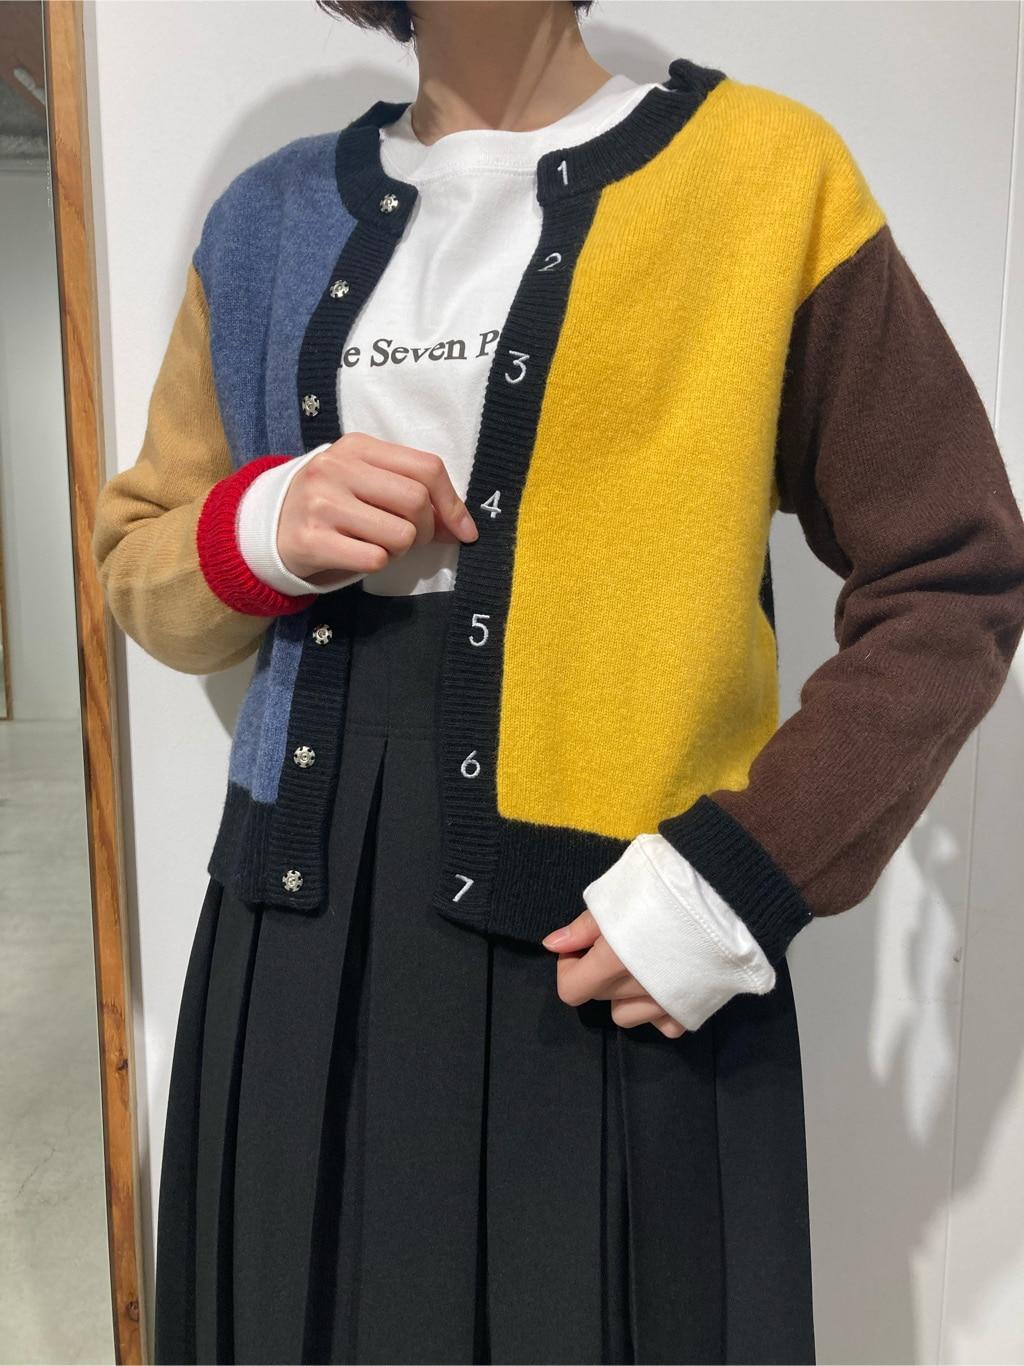 l'atelier du savon 名古屋栄路面 身長:161cm 2021.01.13